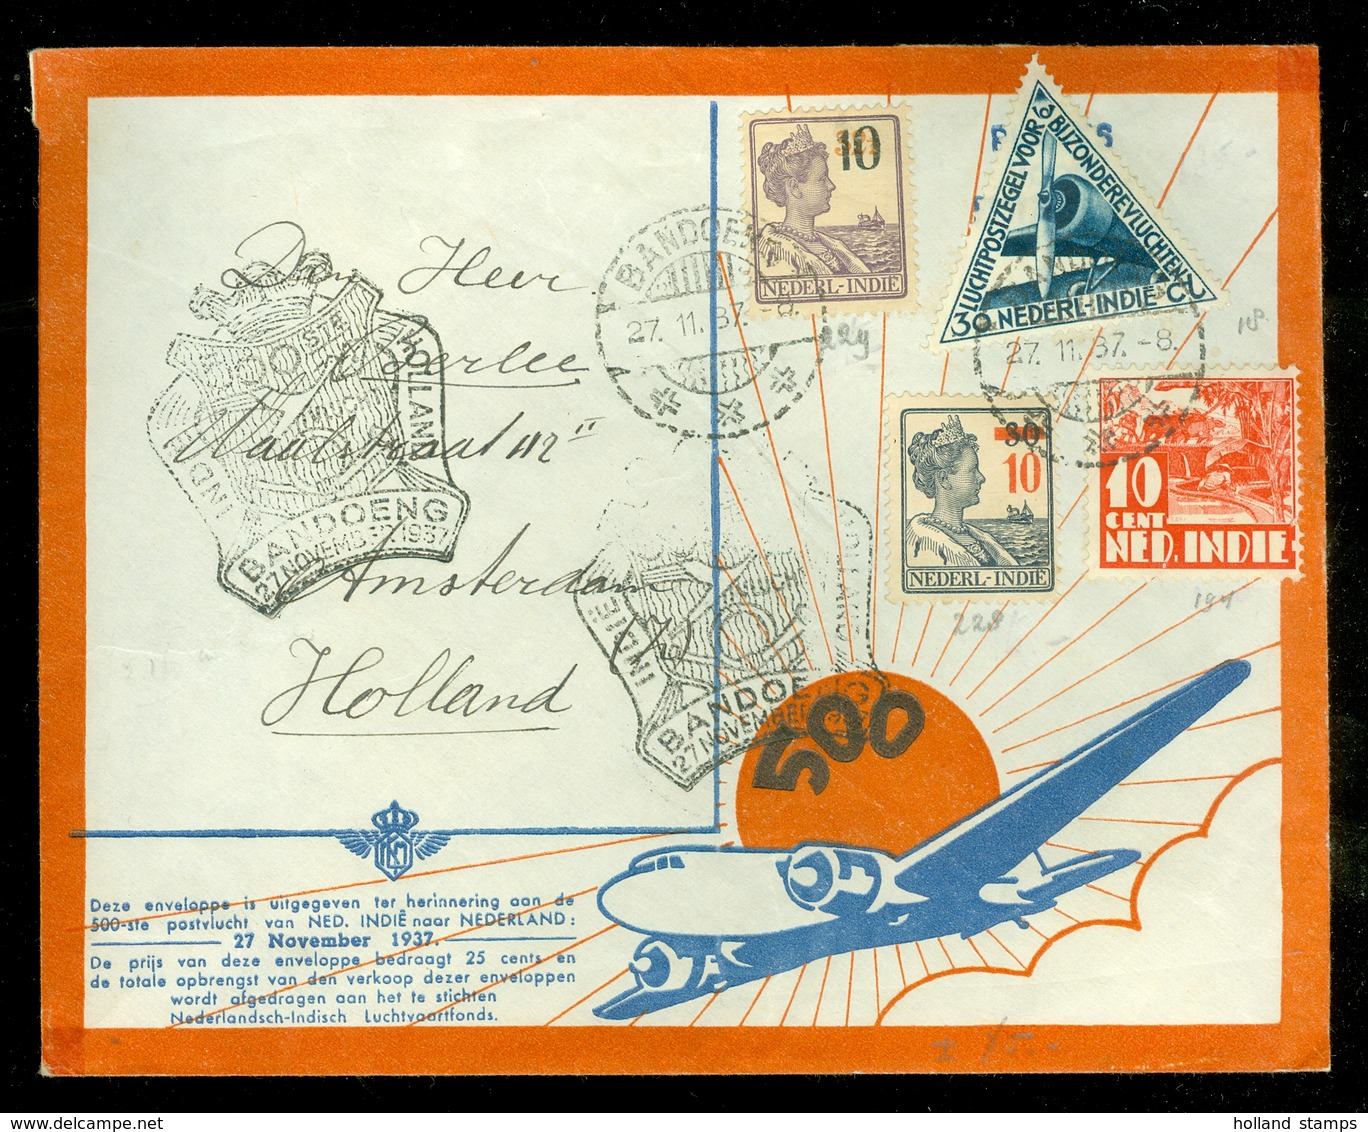 NED-INDIE * LUCHTPOST 500 Ste POSTVLUCHT  BRIEFOMSLAG Uit 1937 Gelopen Van BANDOENG Naar AMSTERDAM  (11.506c) - Nederlands-Indië